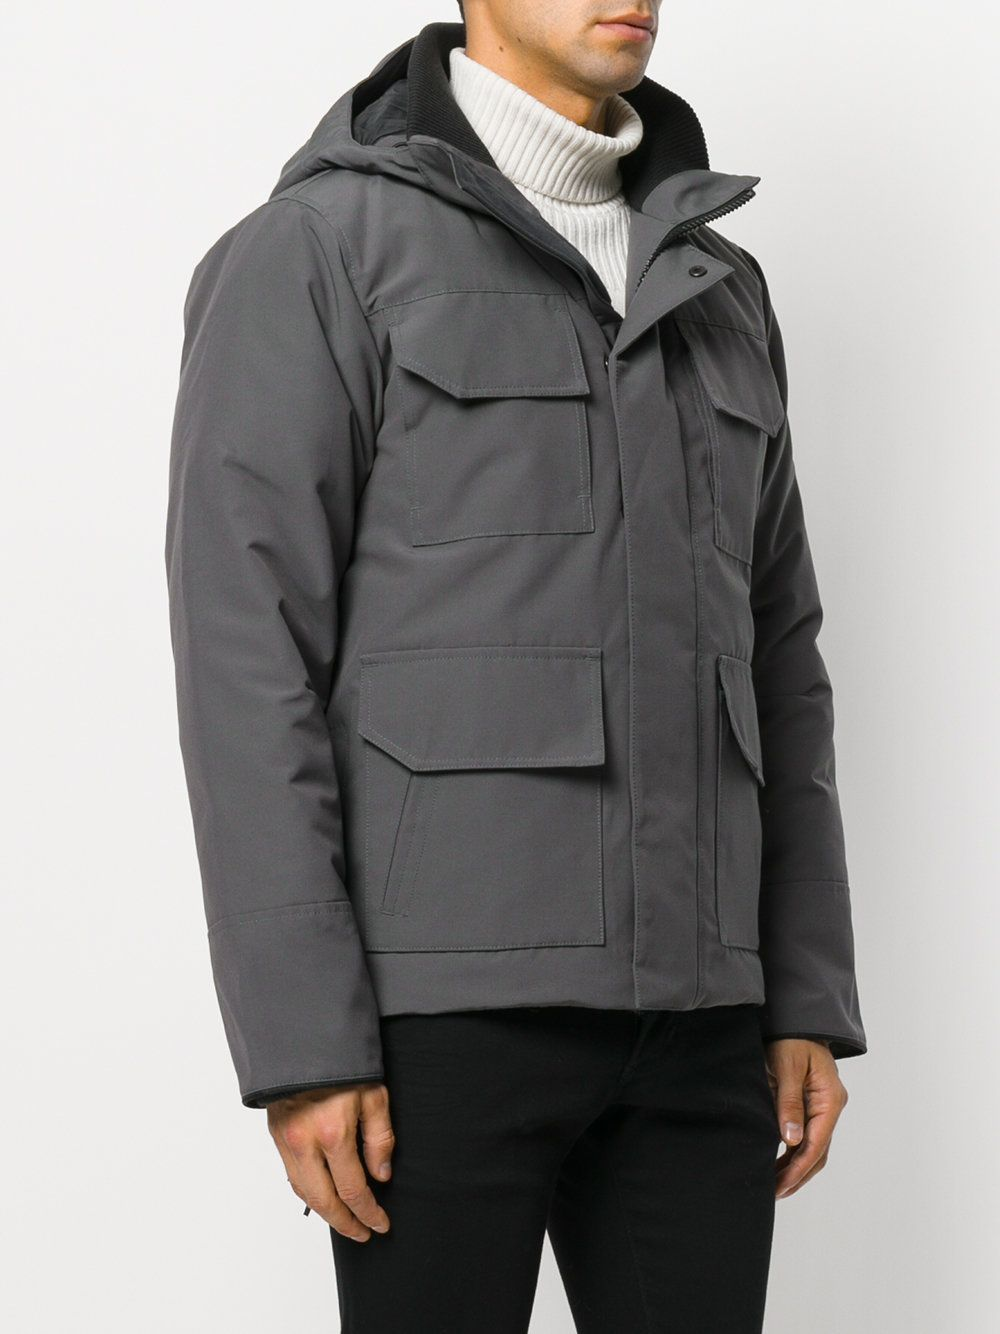 4b728528bdd Canada Goose Maitland jacket | Menswearboard in 2019 | Hooded parka ...